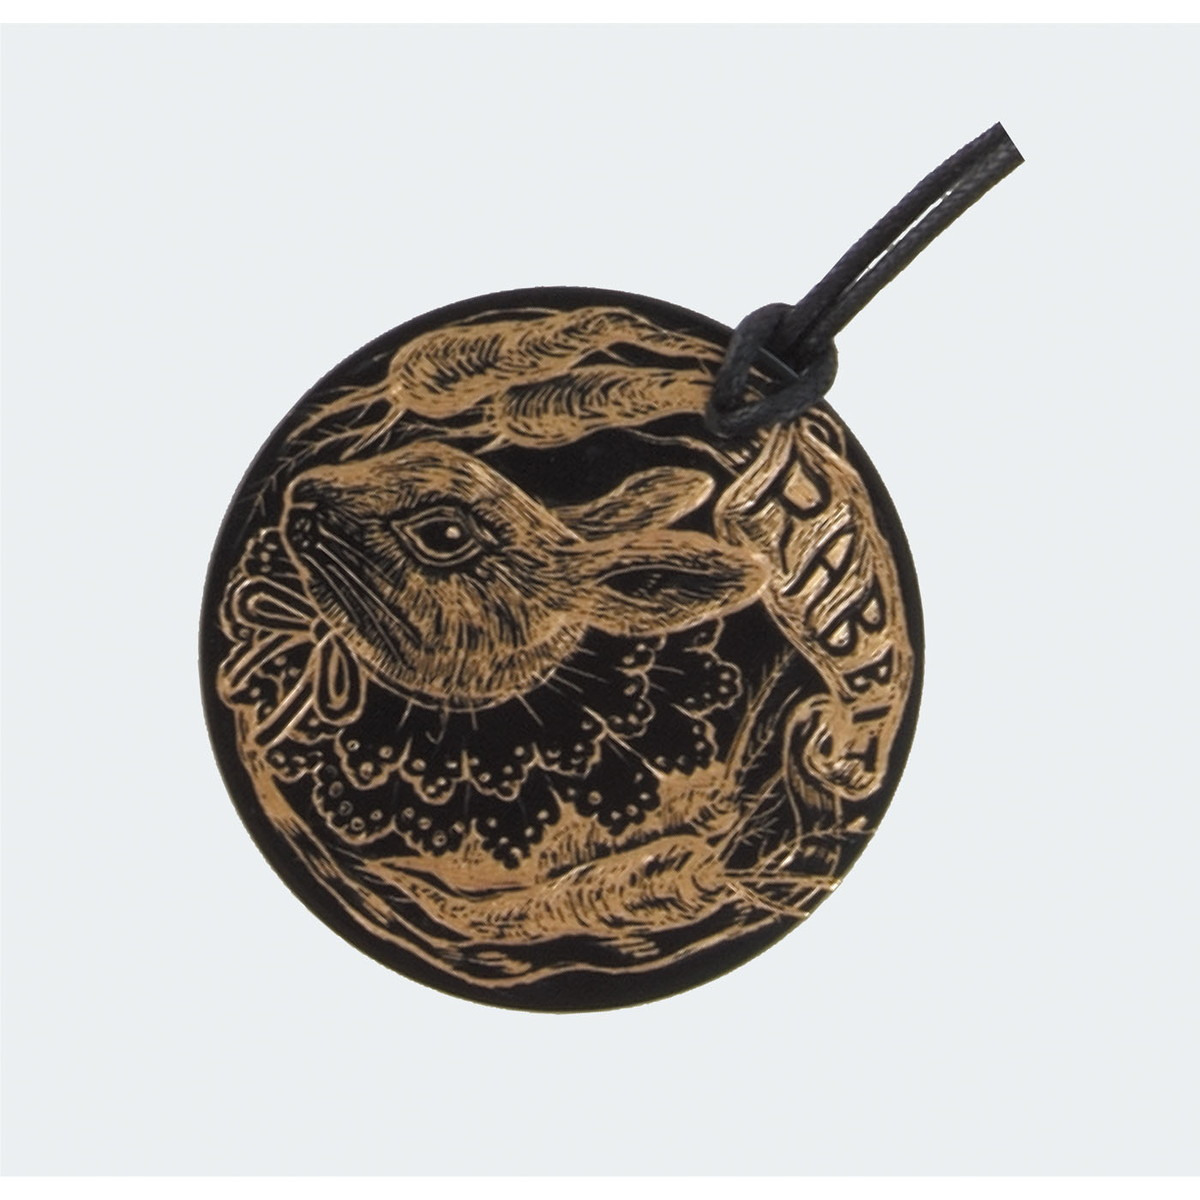 Artec 無料サンプルOK アーテック けがき工芸 アクセサリー #13250 黒 お値打ち価格で 丸